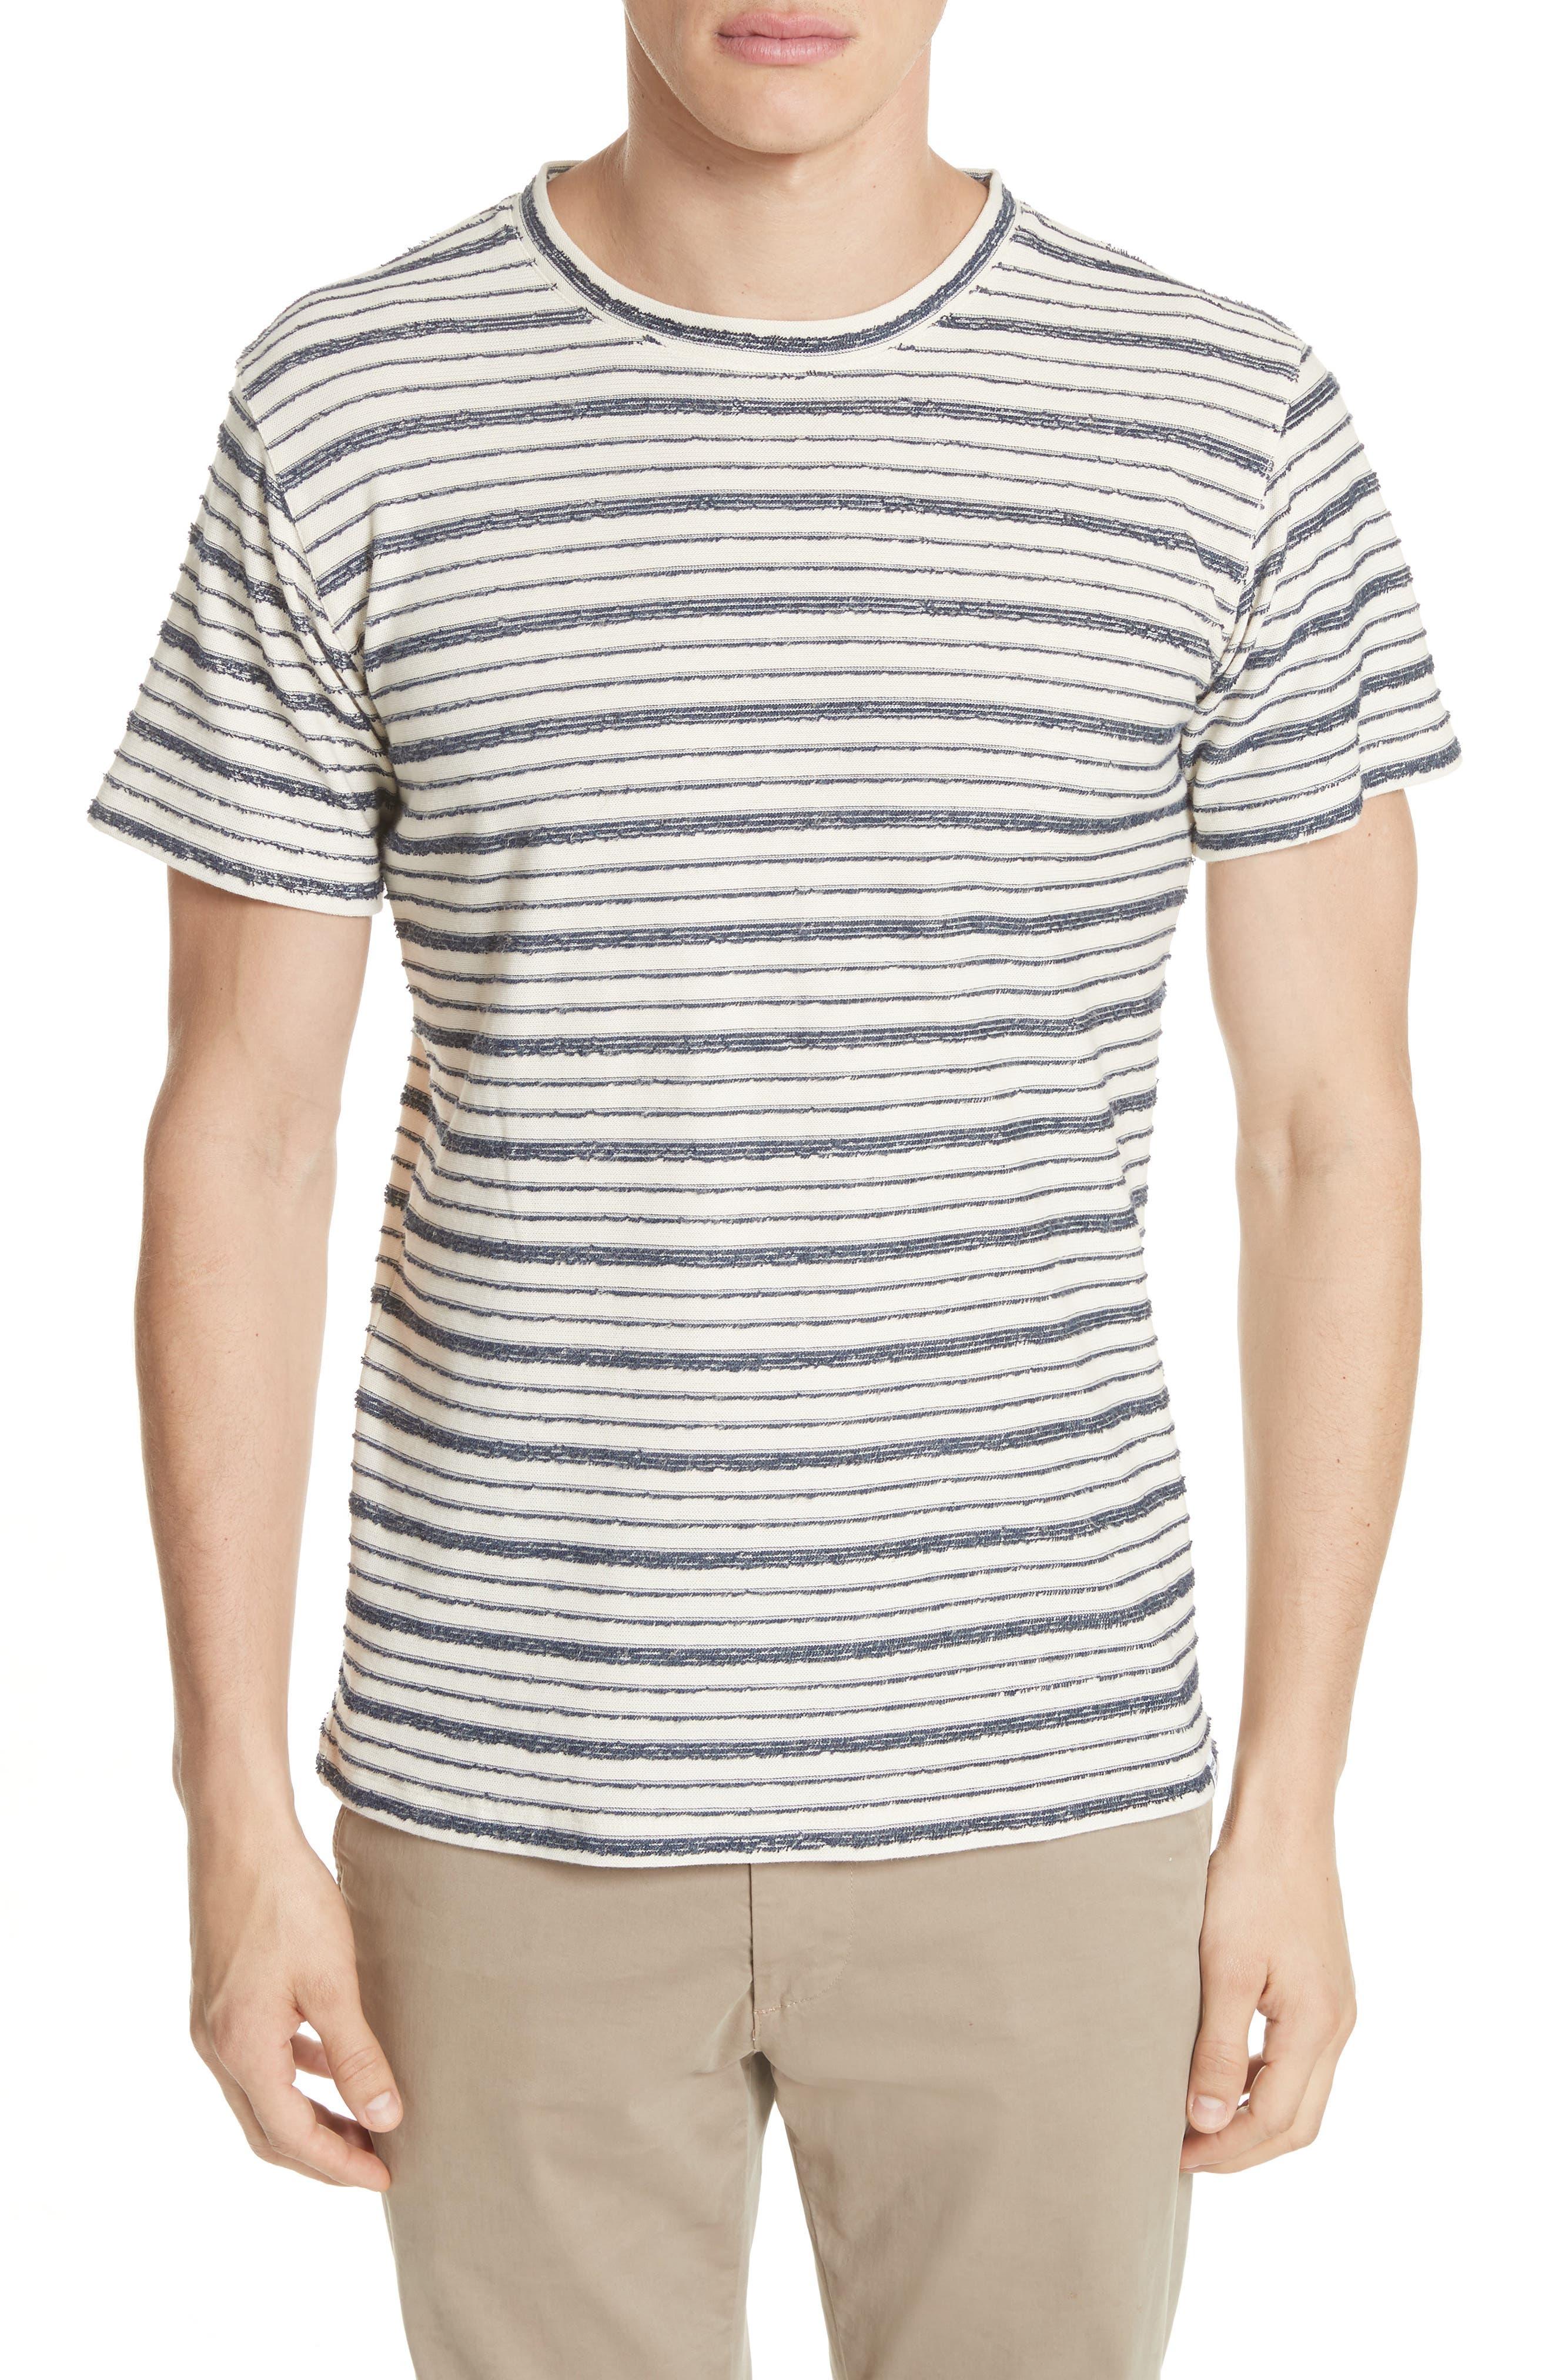 Niels Textured Stripe T-Shirt,                             Main thumbnail 1, color,                             DARK NAVY